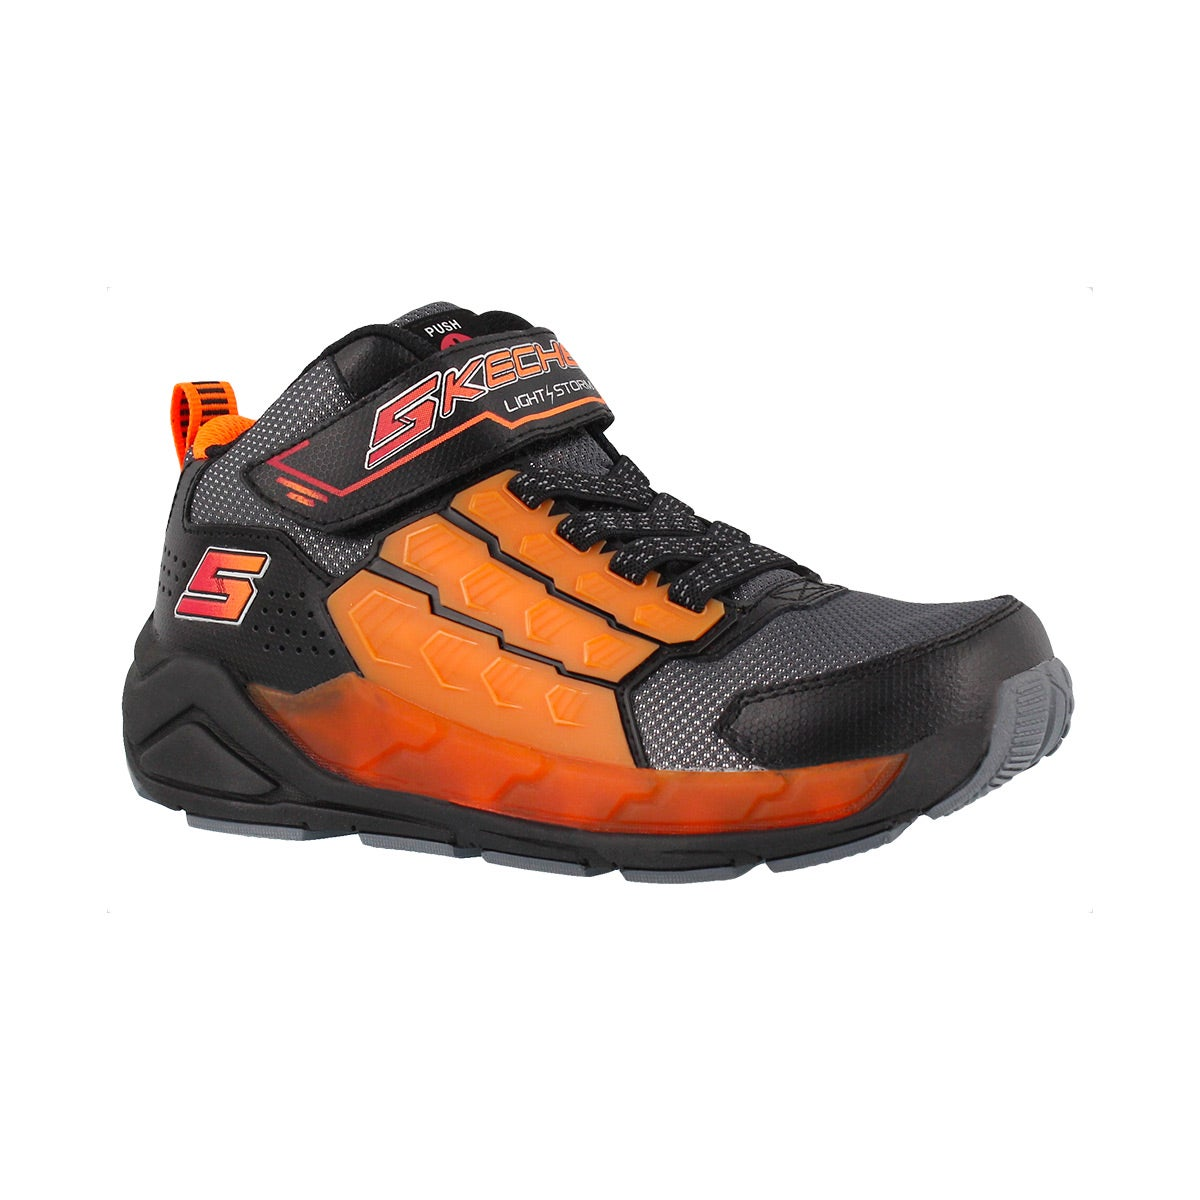 Boys' LIGHT STORM black/orange light up sneakers